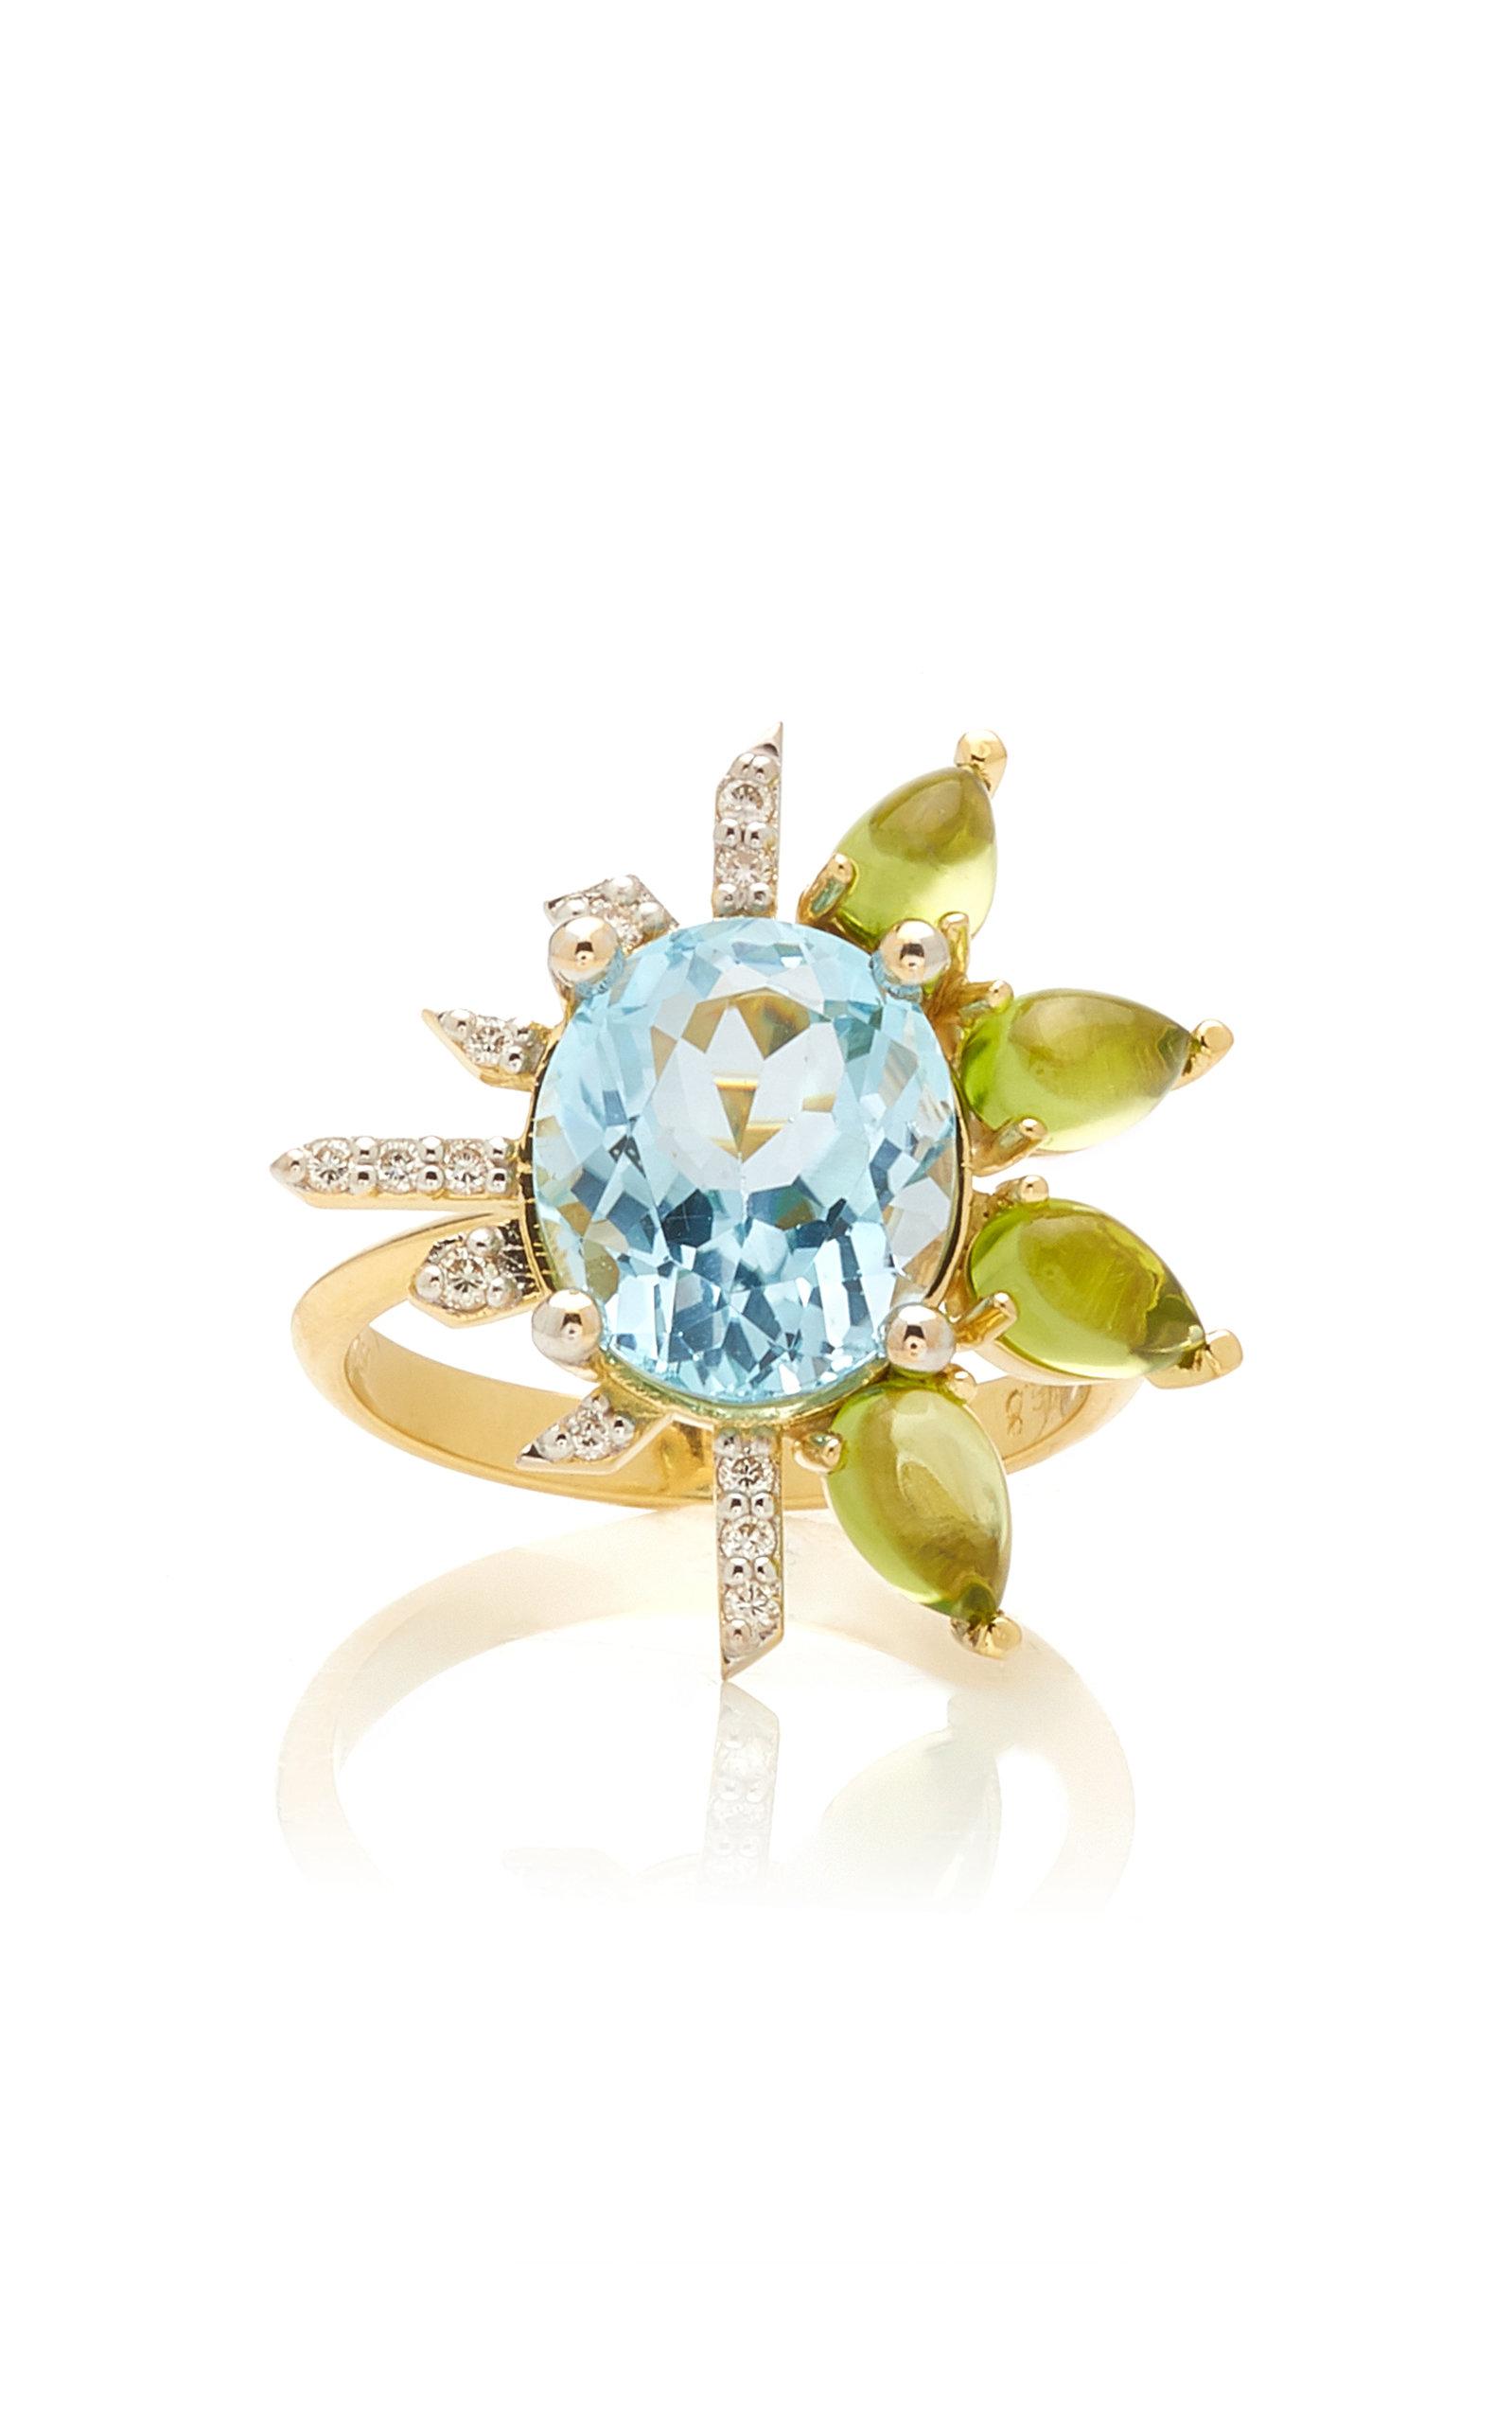 Women's Royal 18K Yellow Gold Topaz; Diamond; Peridot Ring